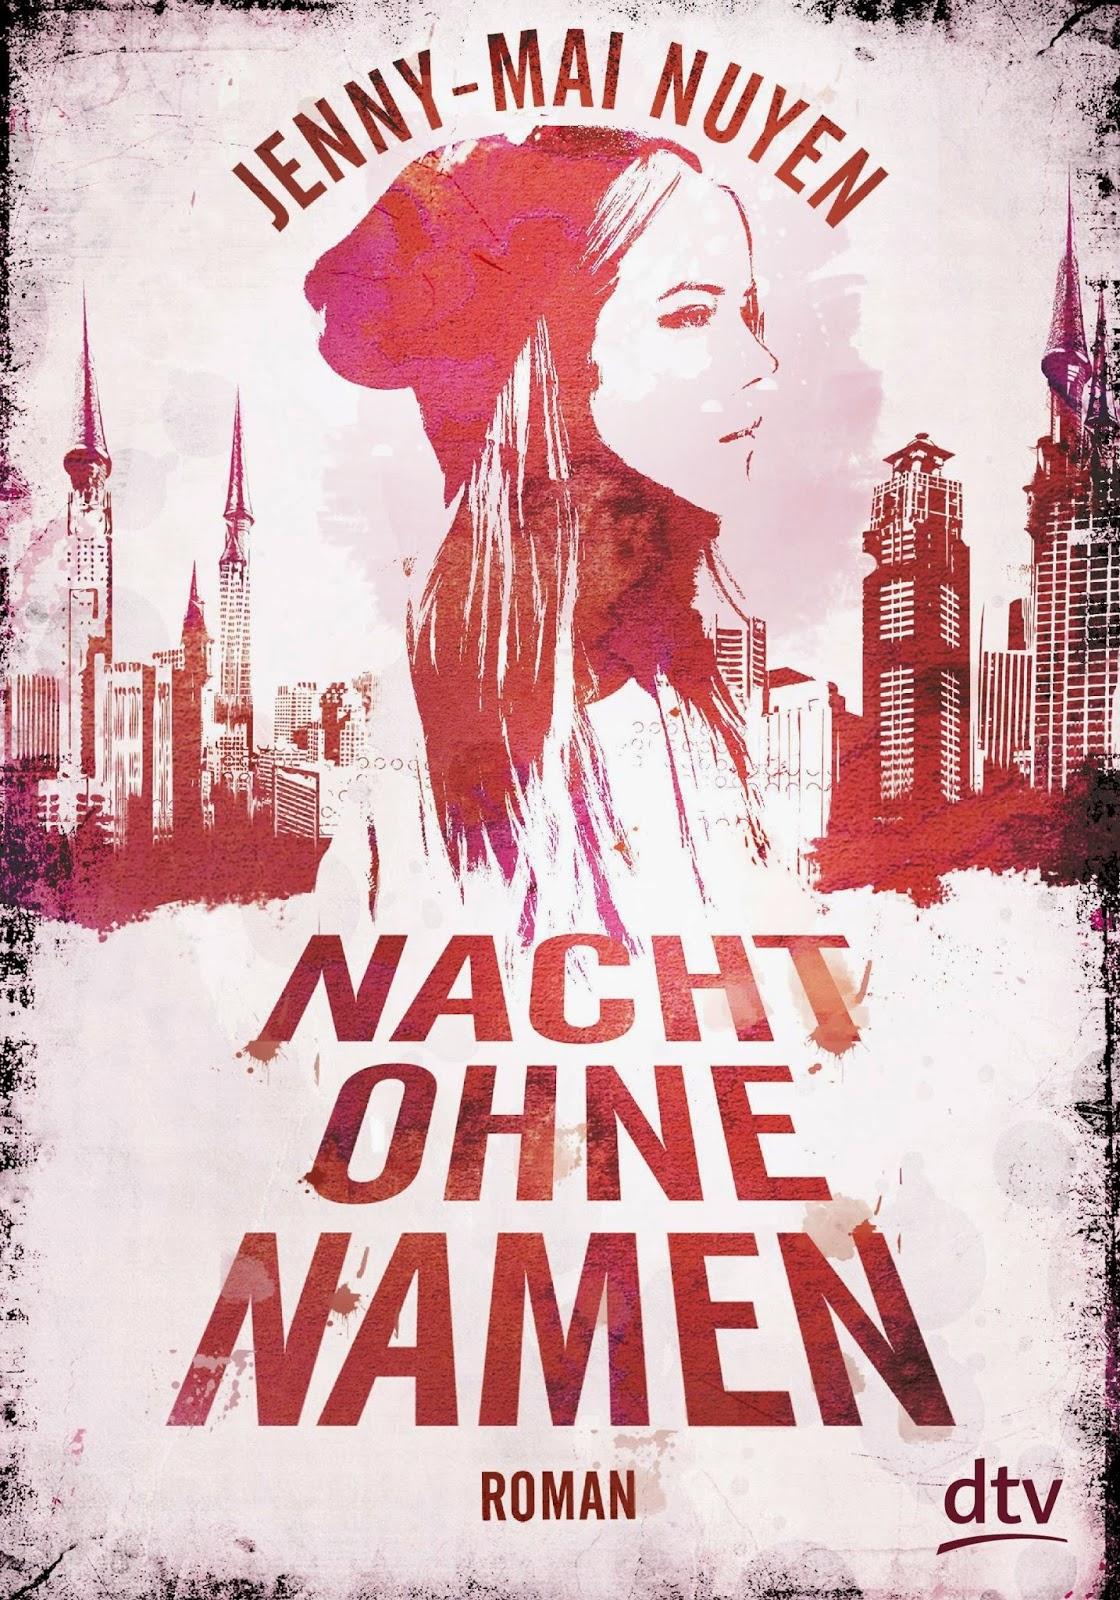 http://www.amazon.de/Nacht-ohne-Namen-Jenny-Mai-Nuyen/dp/3423761091/ref=sr_1_1_twi_1_har?ie=UTF8&qid=1427557533&sr=8-1&keywords=nacht+ohne+namen